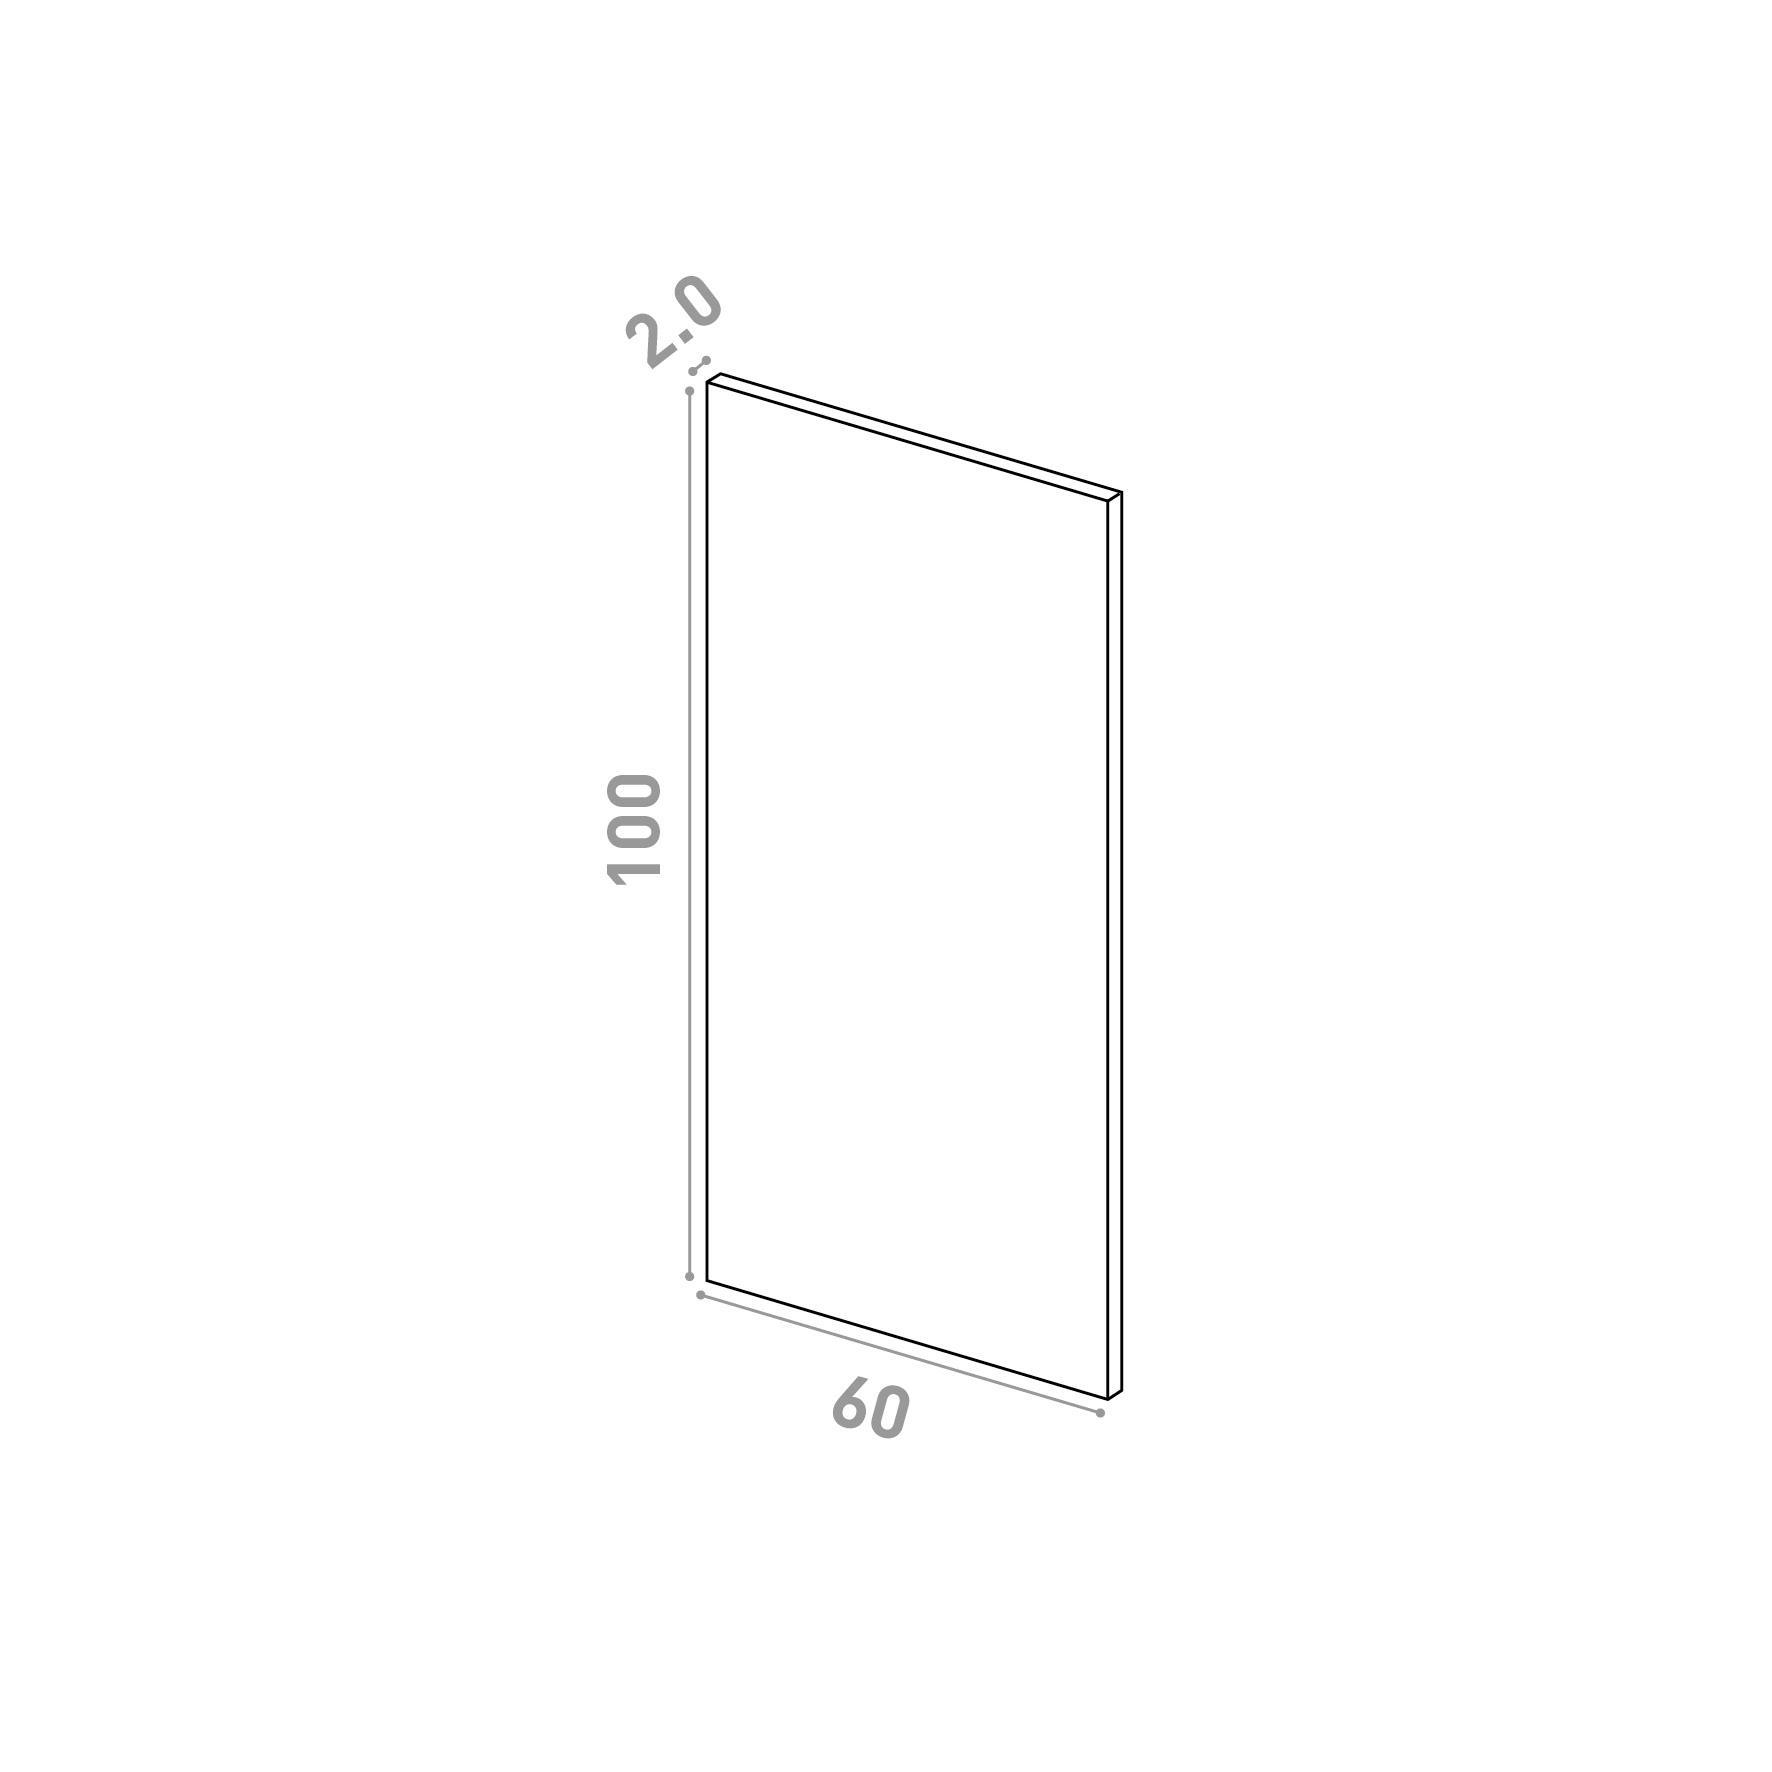 Porte 60X100cm   design lisse   chêne naturel